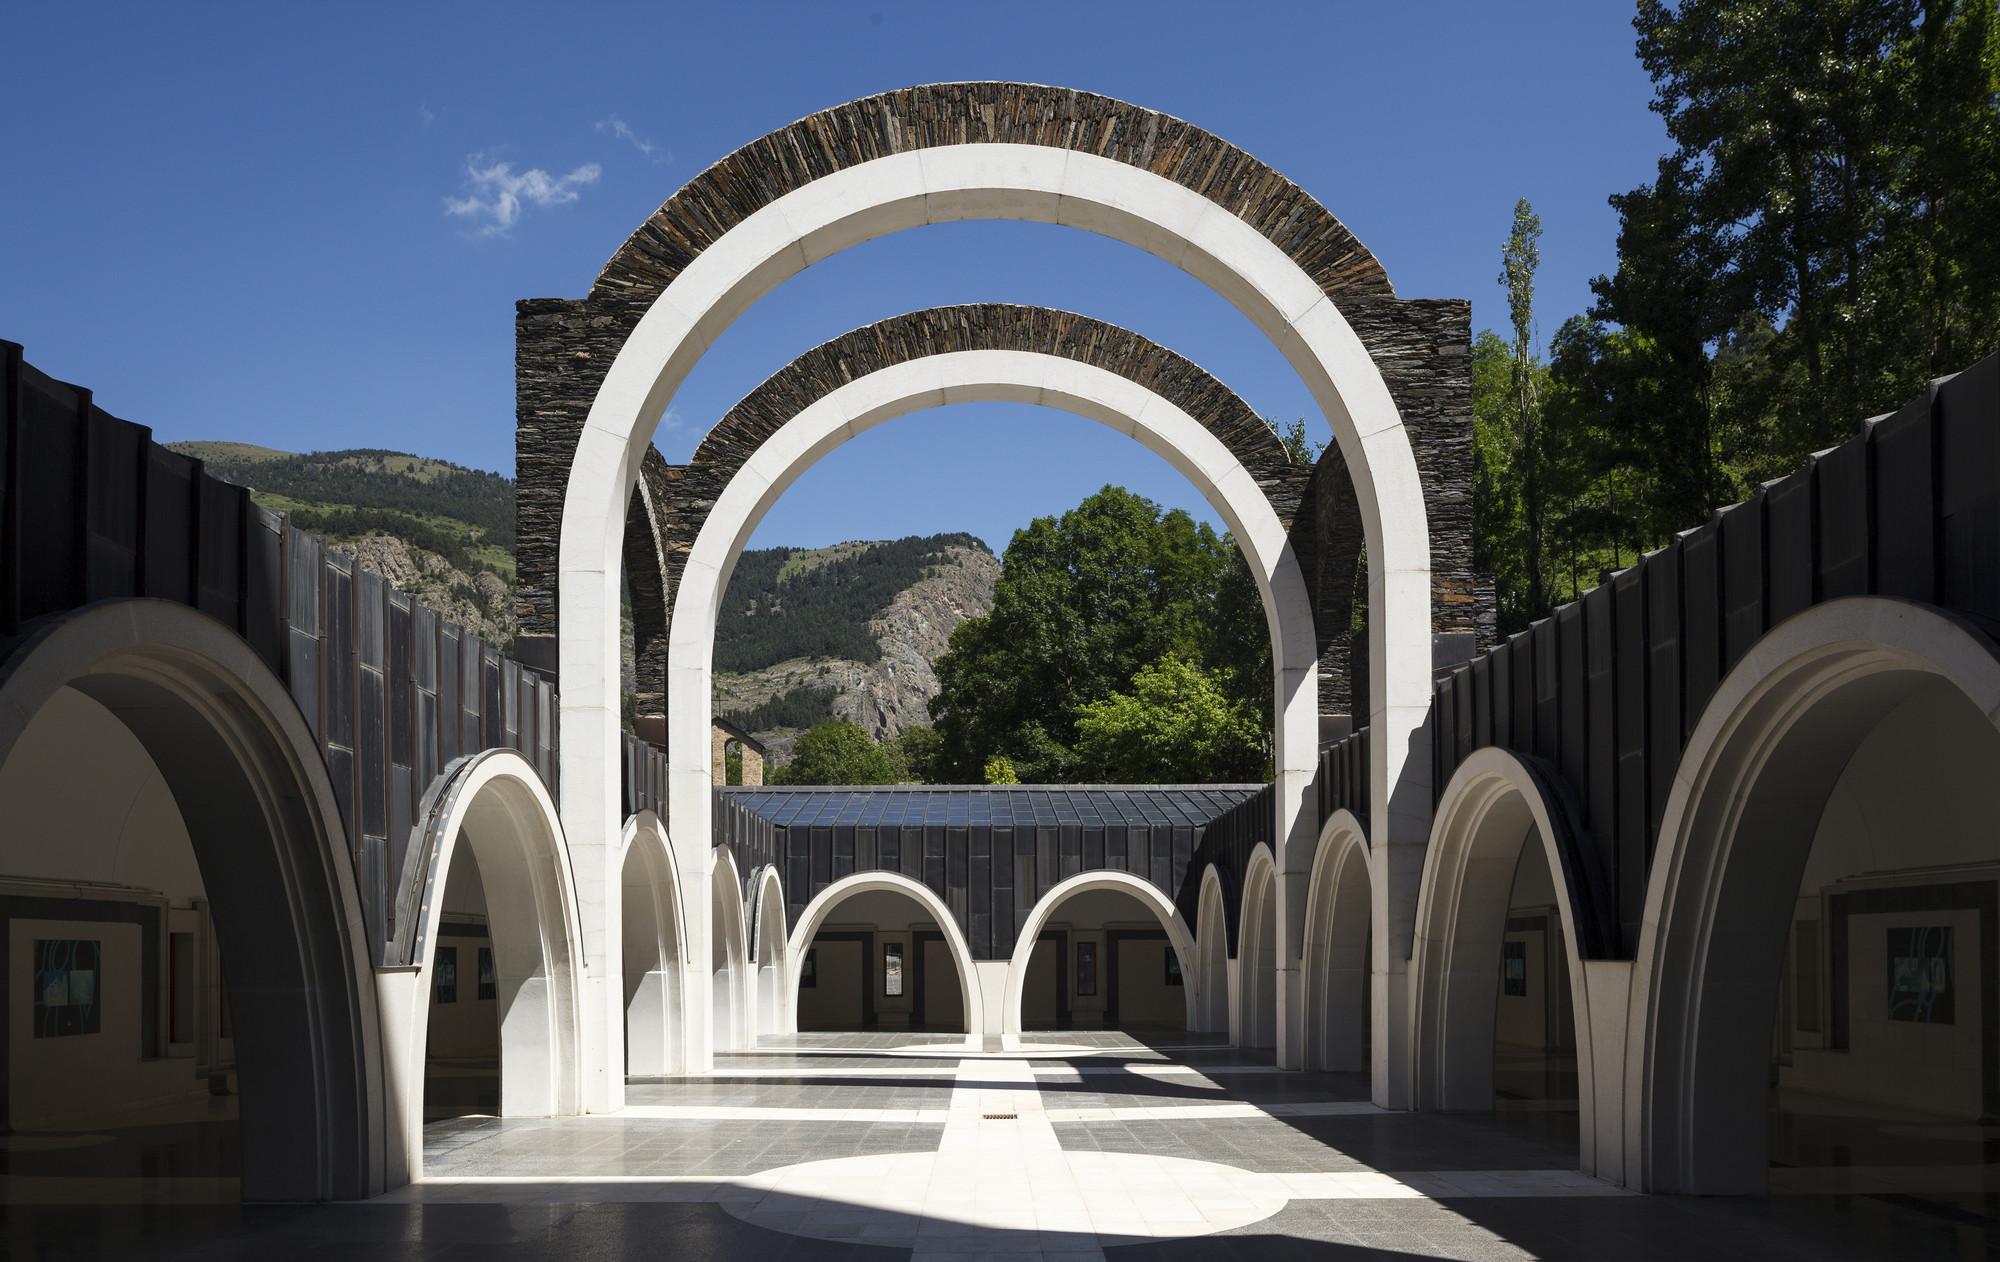 Classic: Maritxell Sanctuary / Ricardo Bofill, Courtesy of Ricardo Bofill